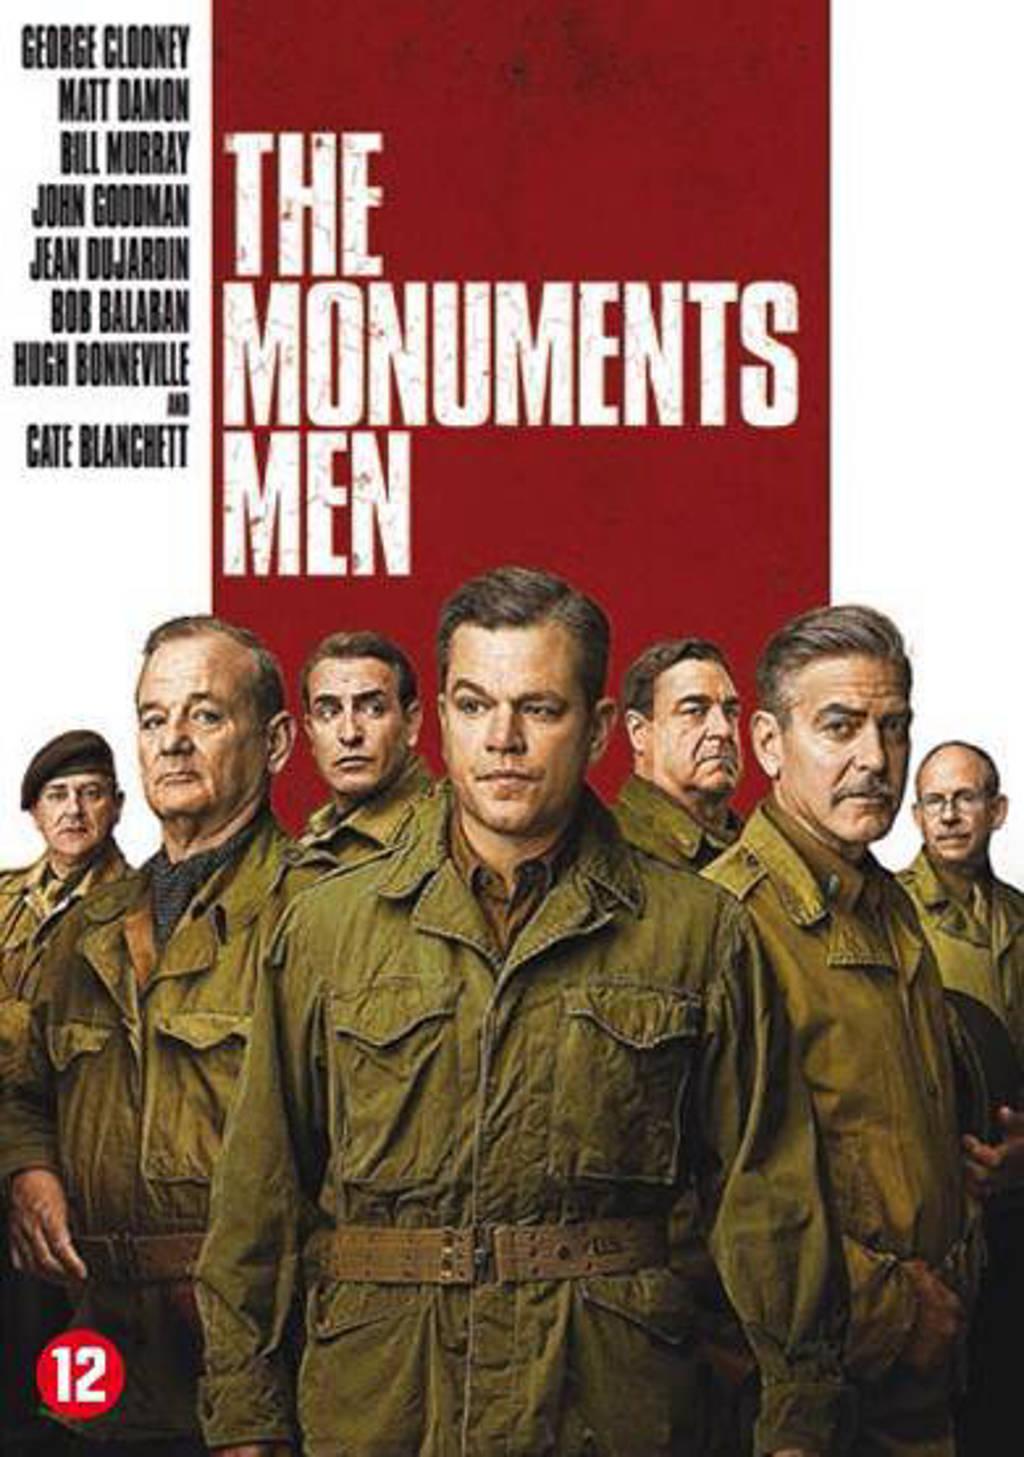 Monuments men (DVD)